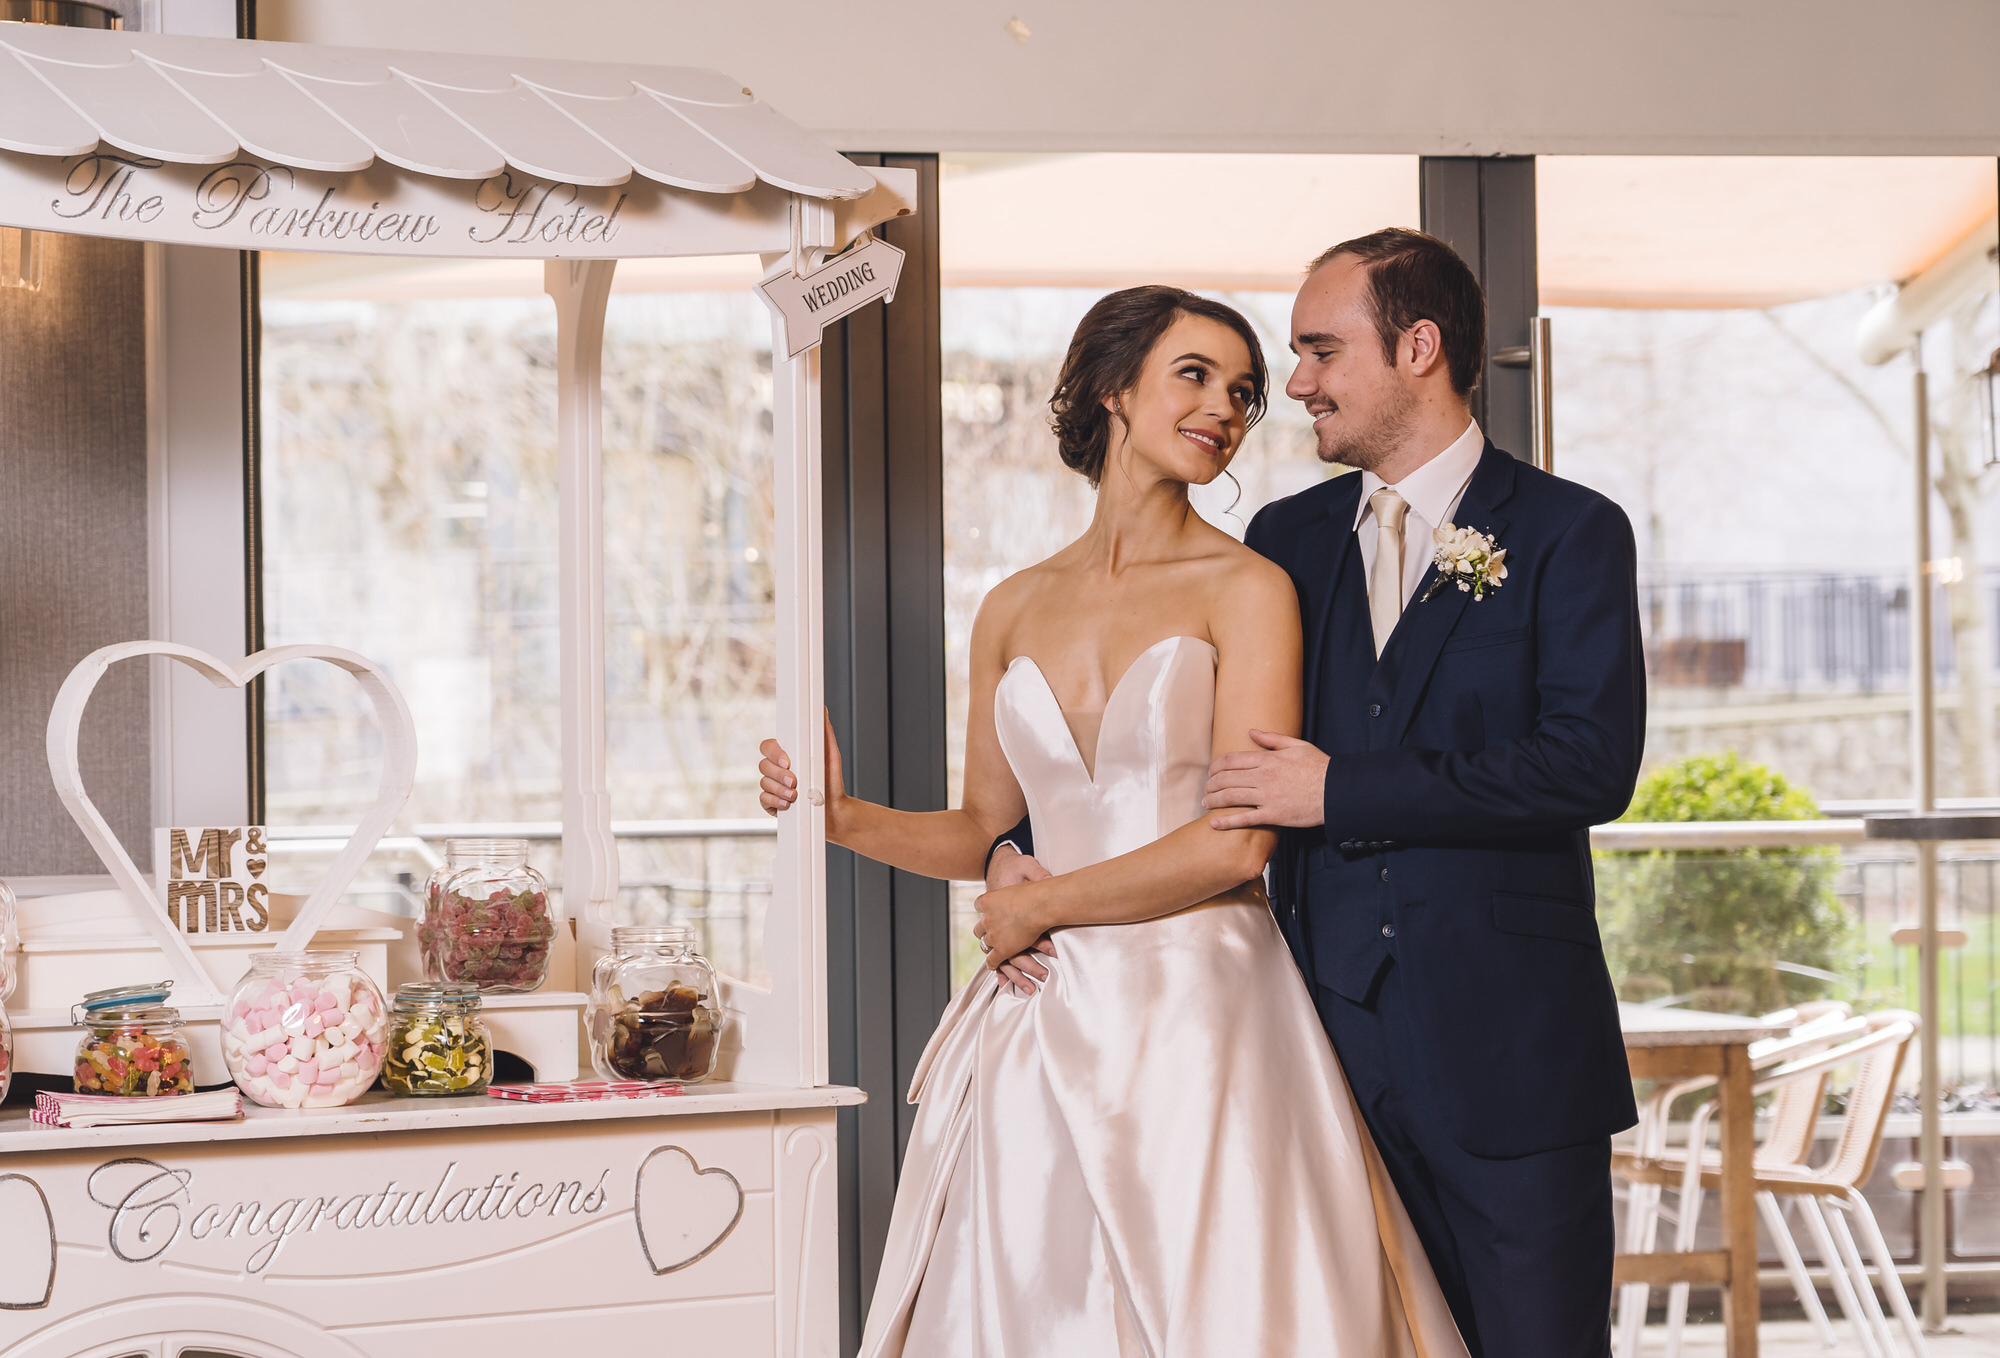 Roger-kenny-wedding-photographer-wicklow_118.jpg